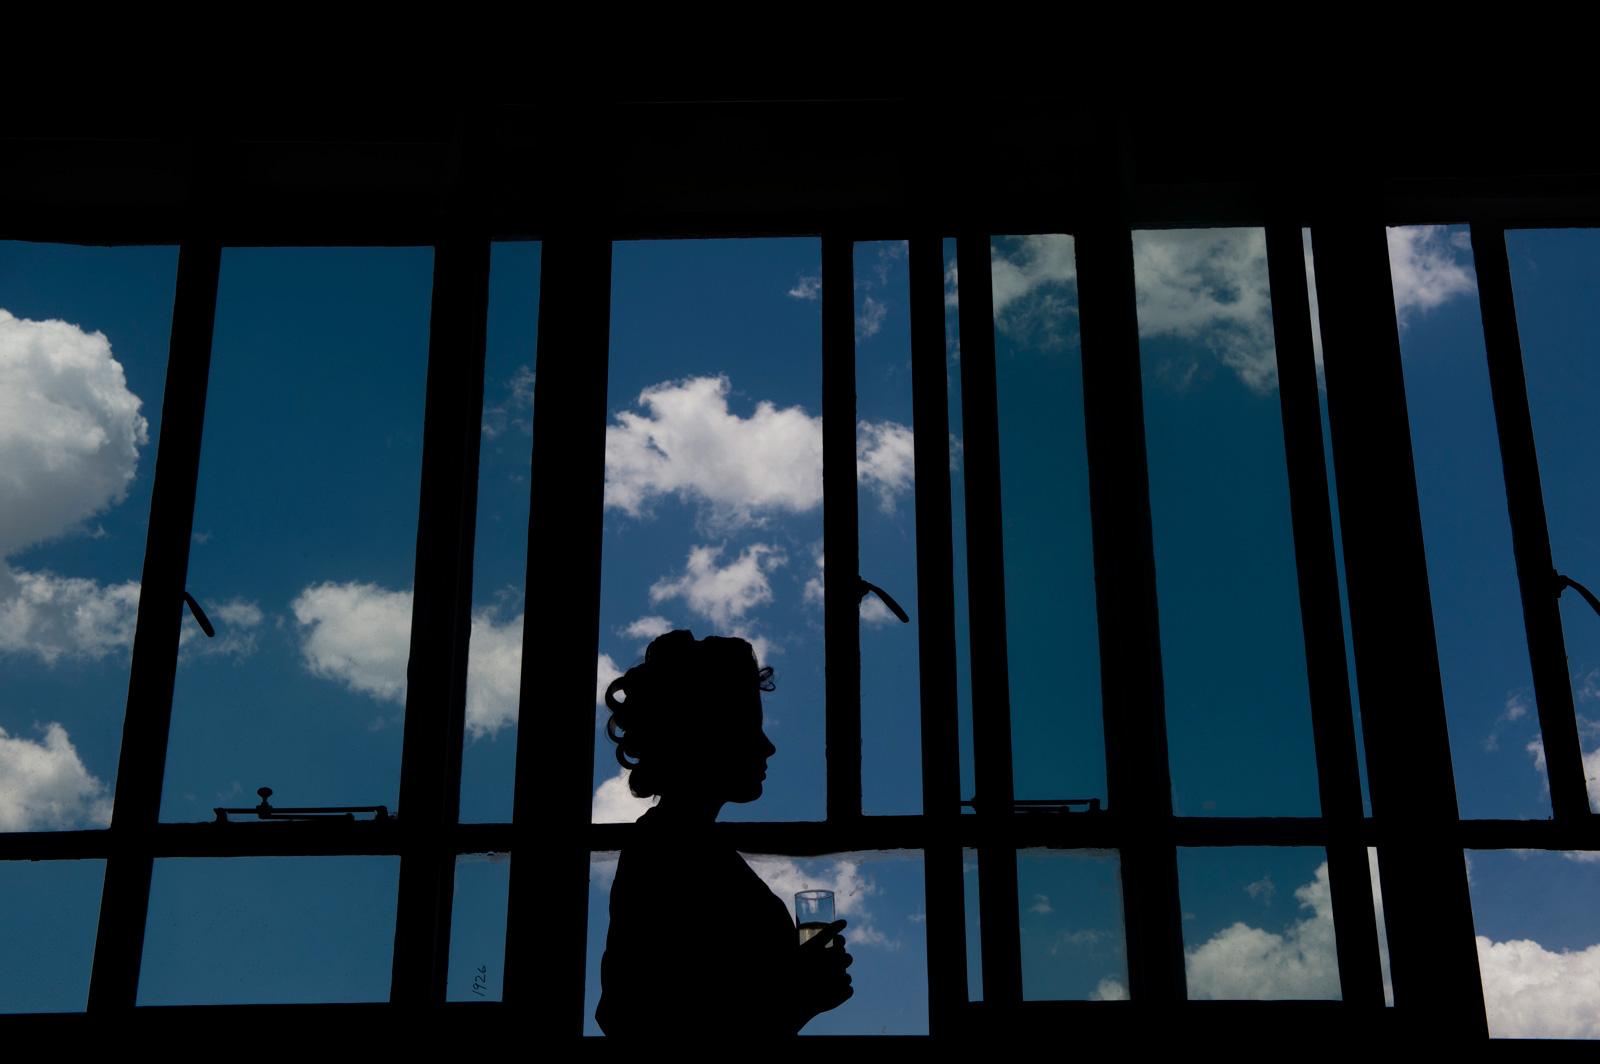 cloud silhouette